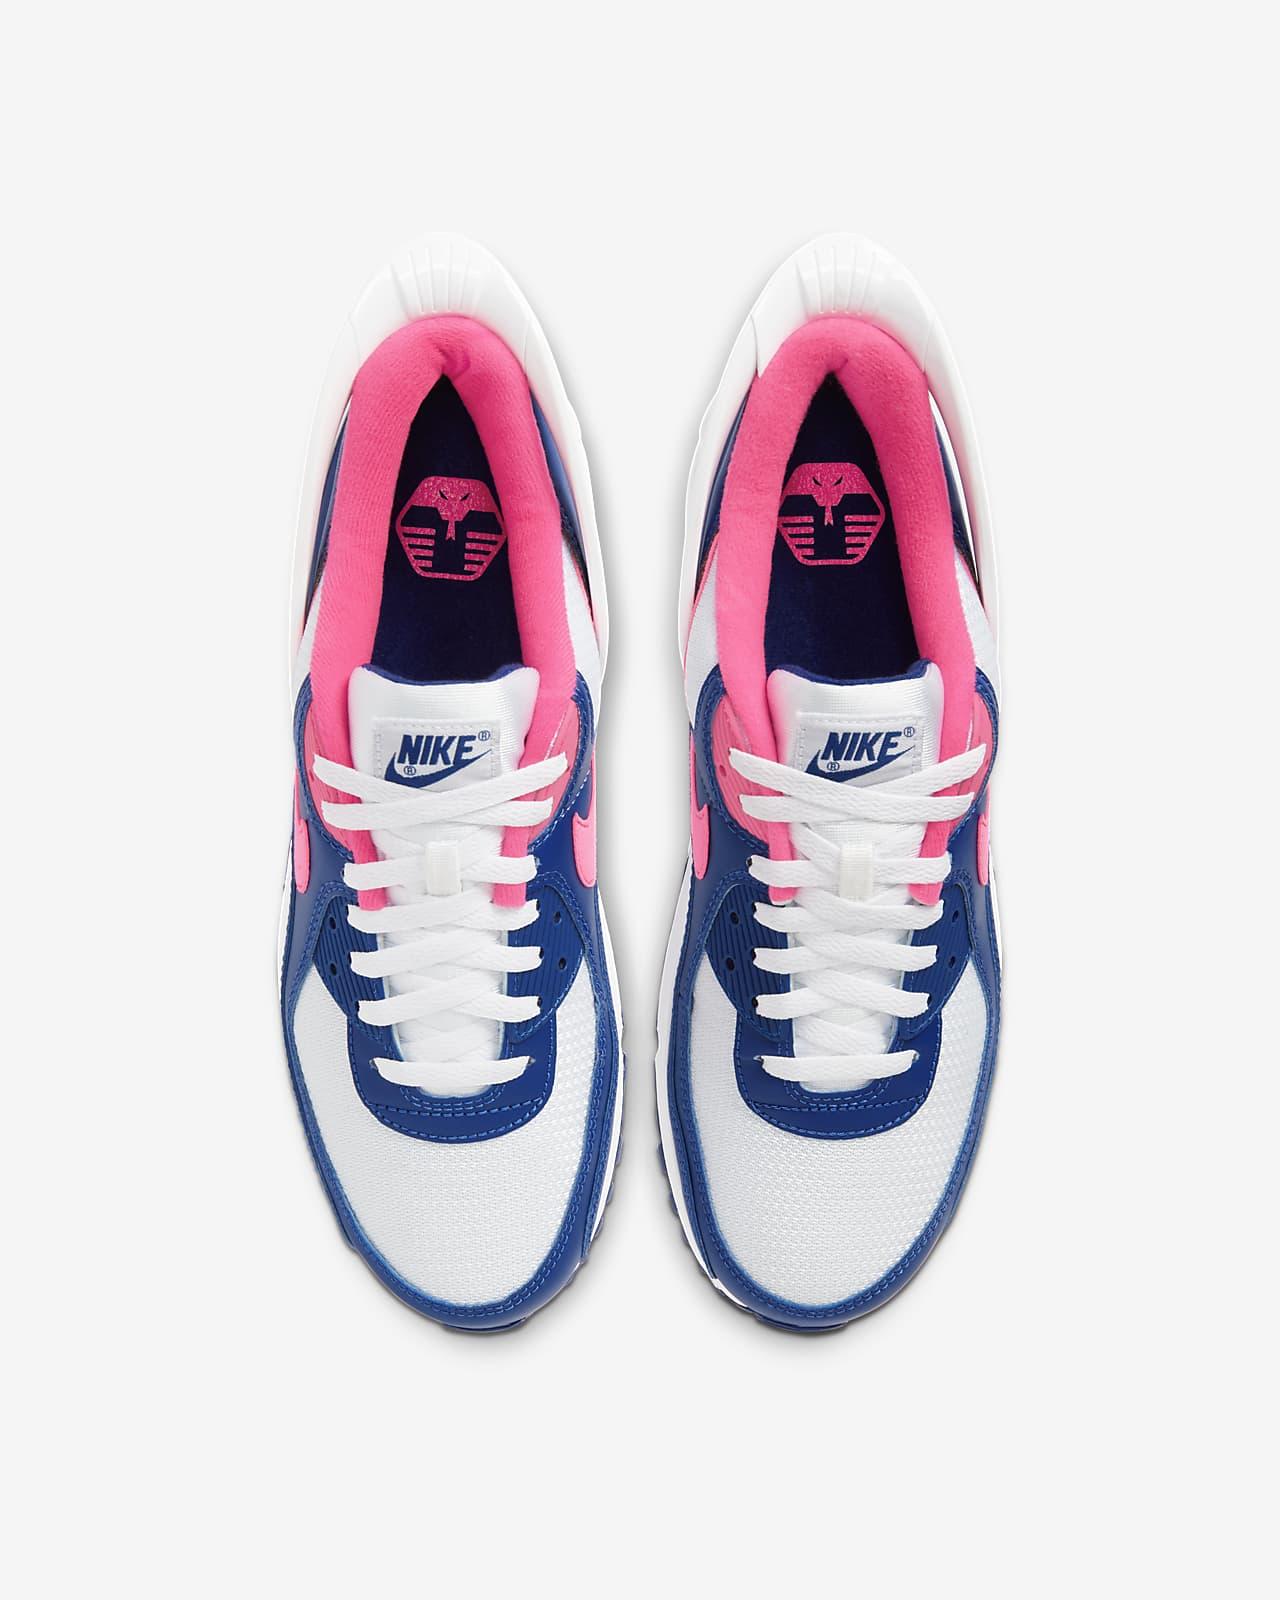 Nike Air Max 90 FlyEase Shoe. Nike LU